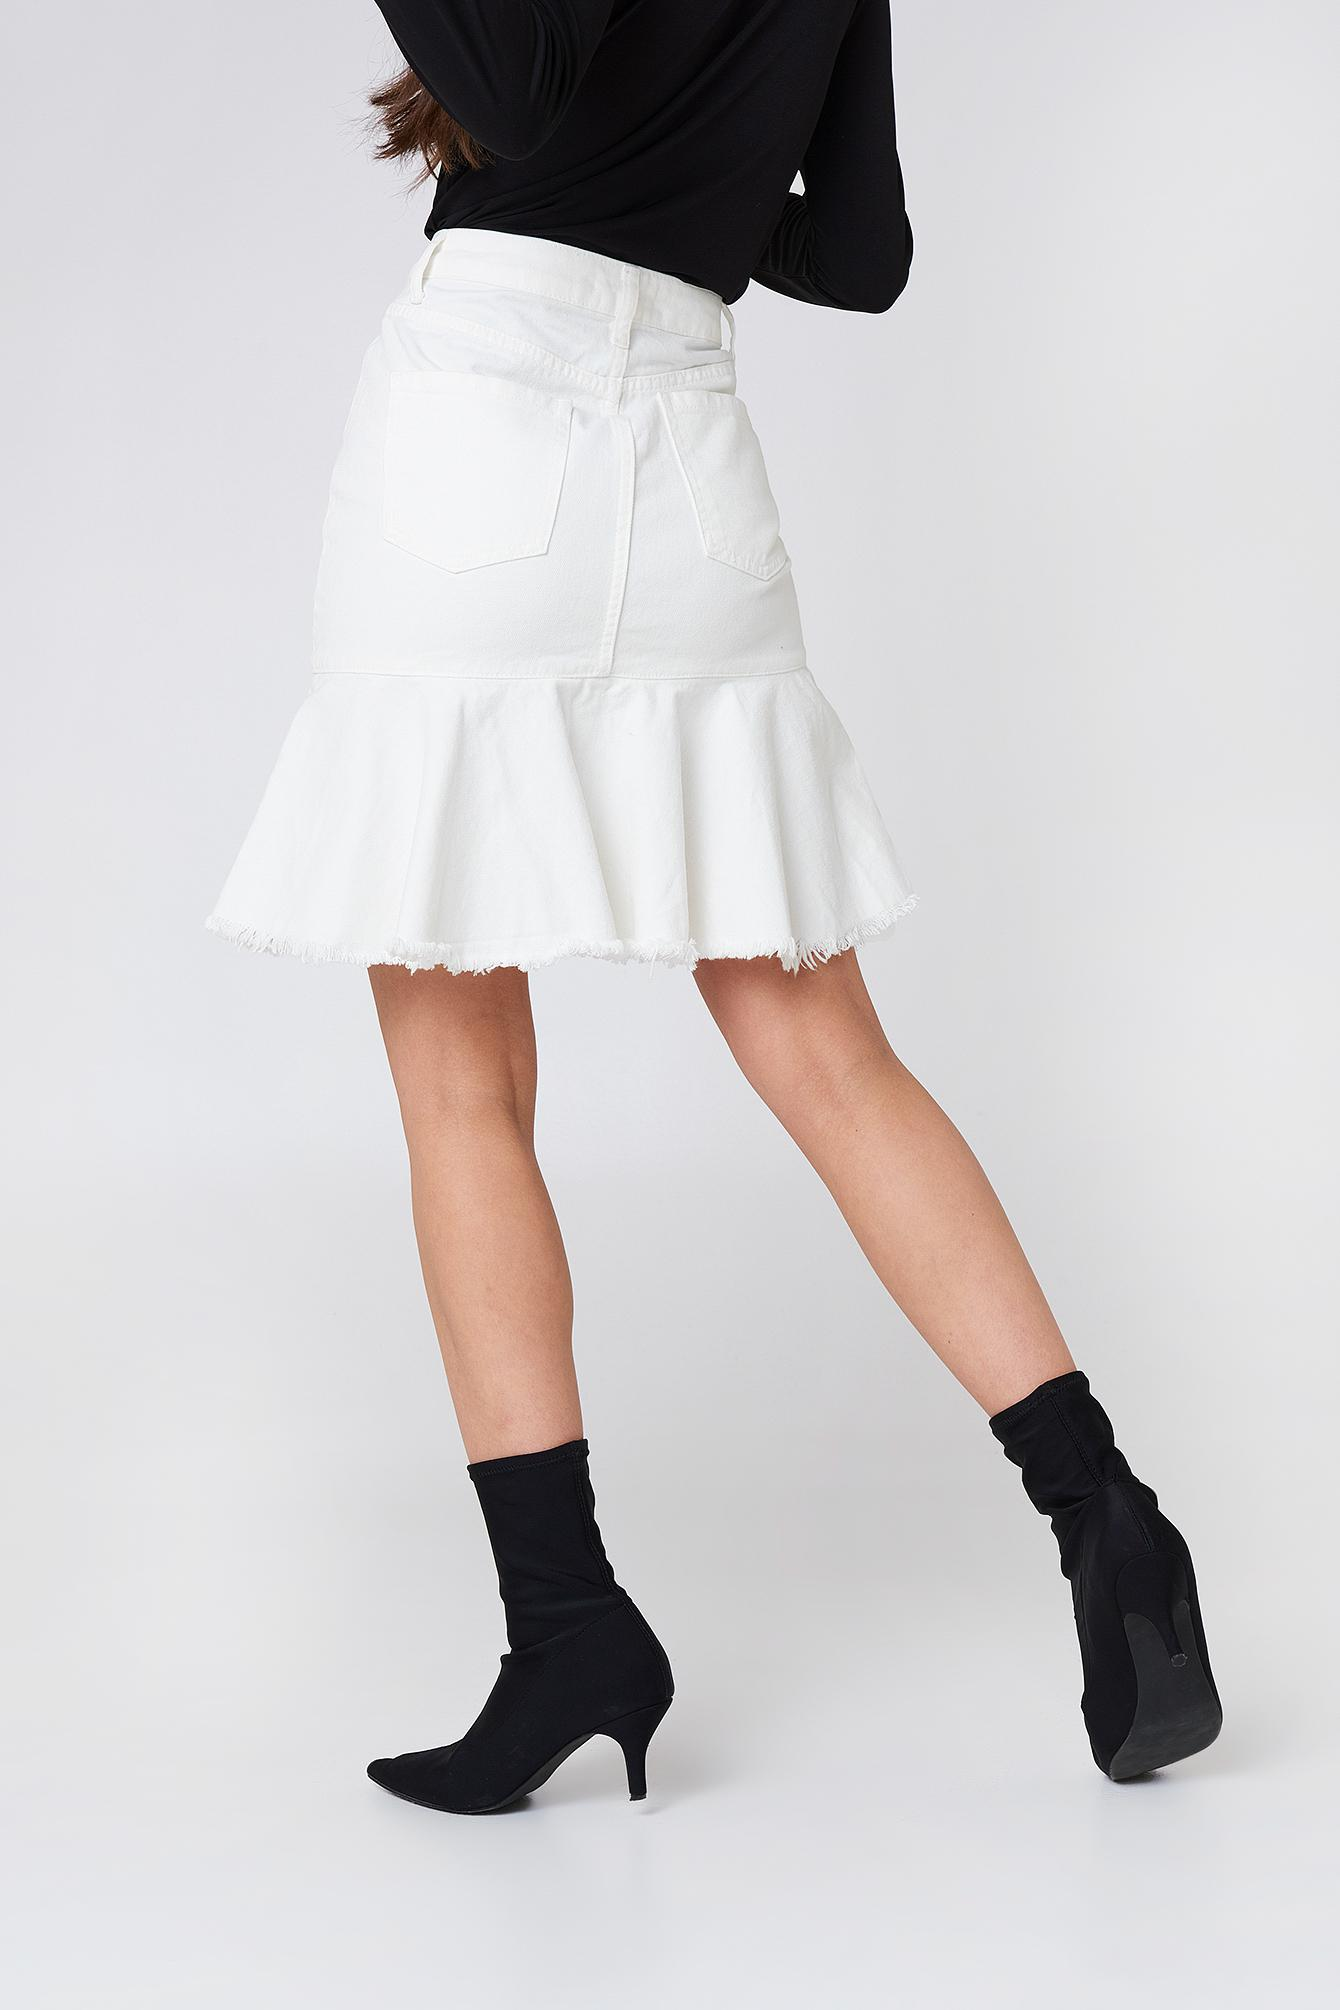 65610071e8 NA-KD Raw Frill Hem Denim Skirt White in White - Save 70% - Lyst